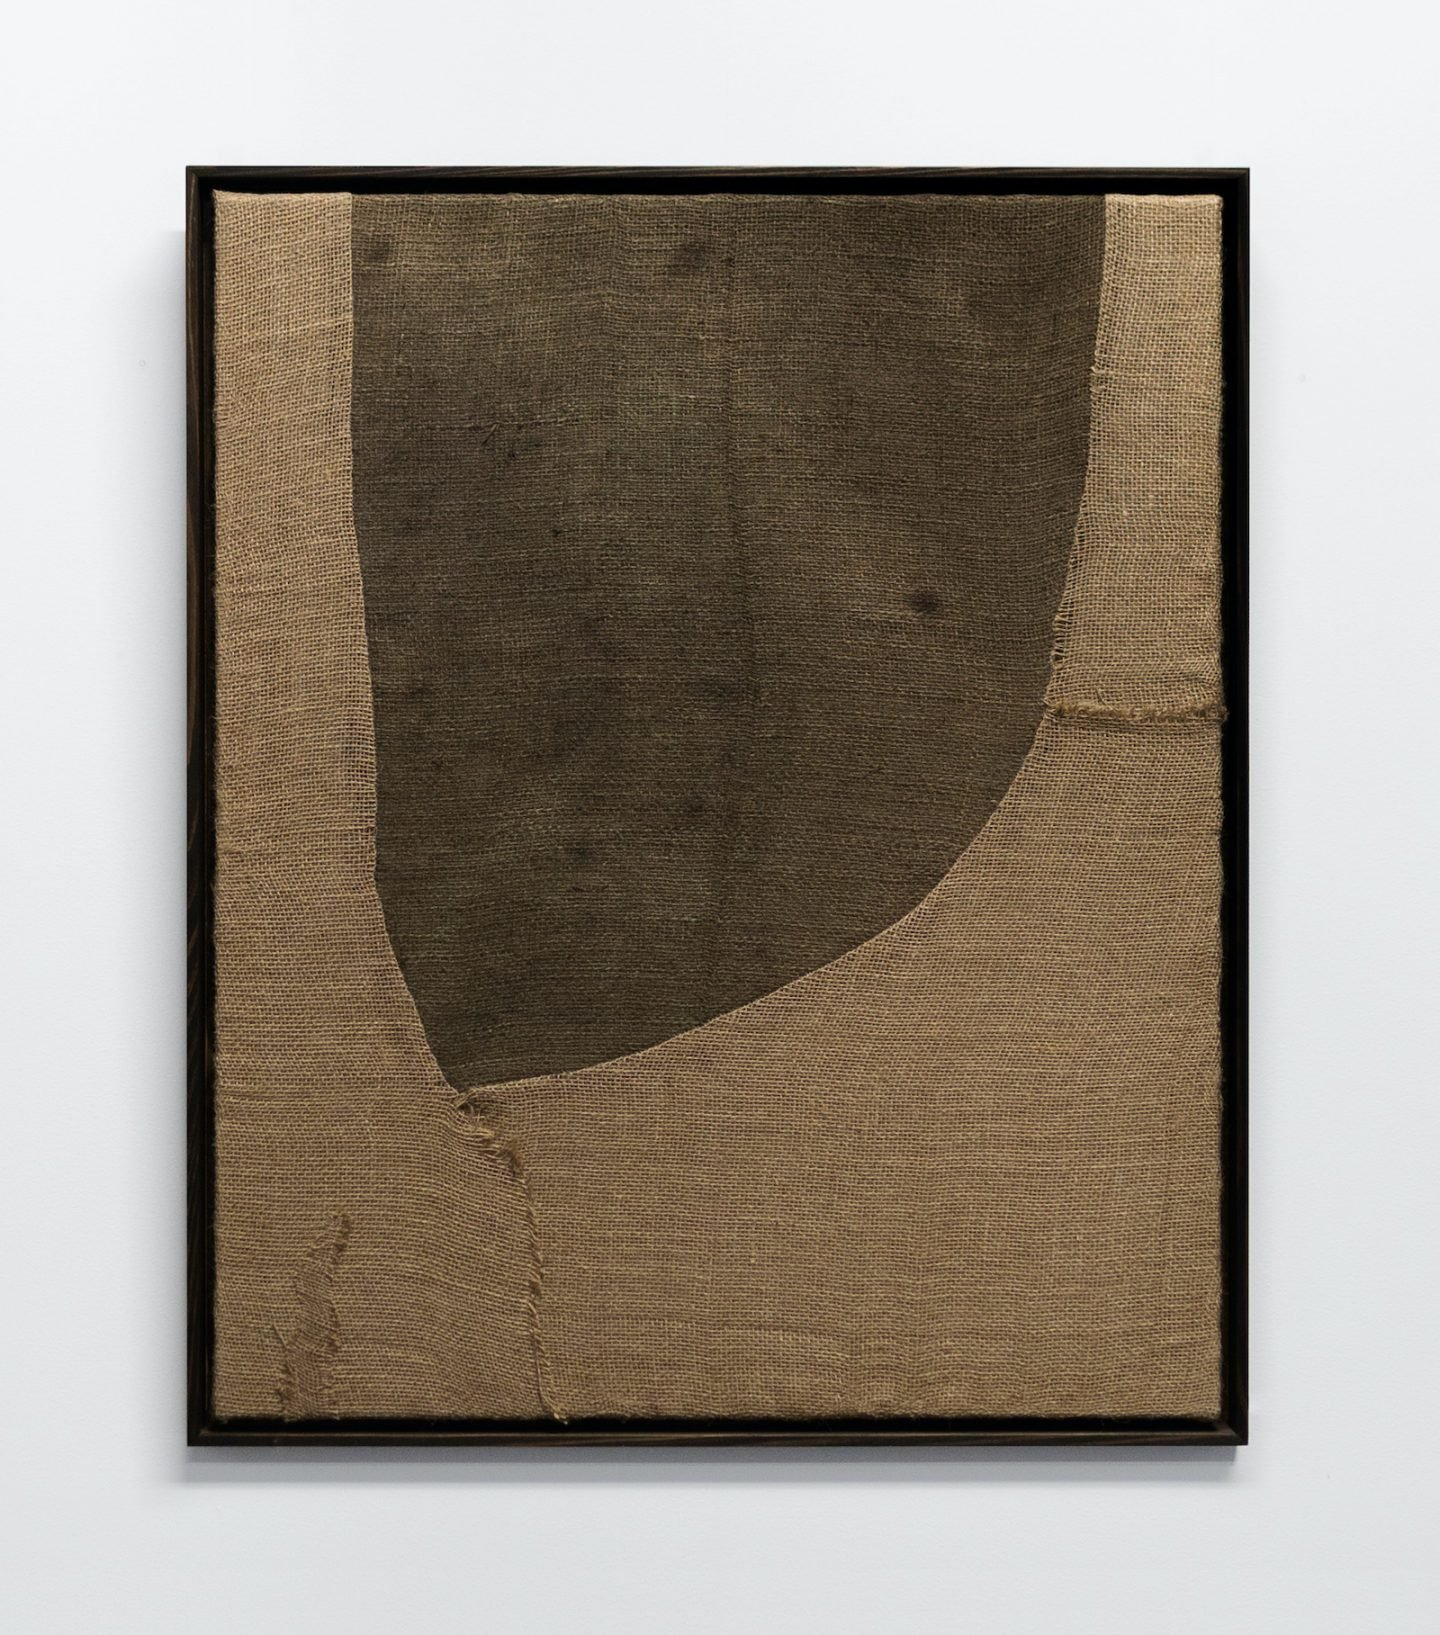 IGNANT-Art-Morgan-Stokes-002